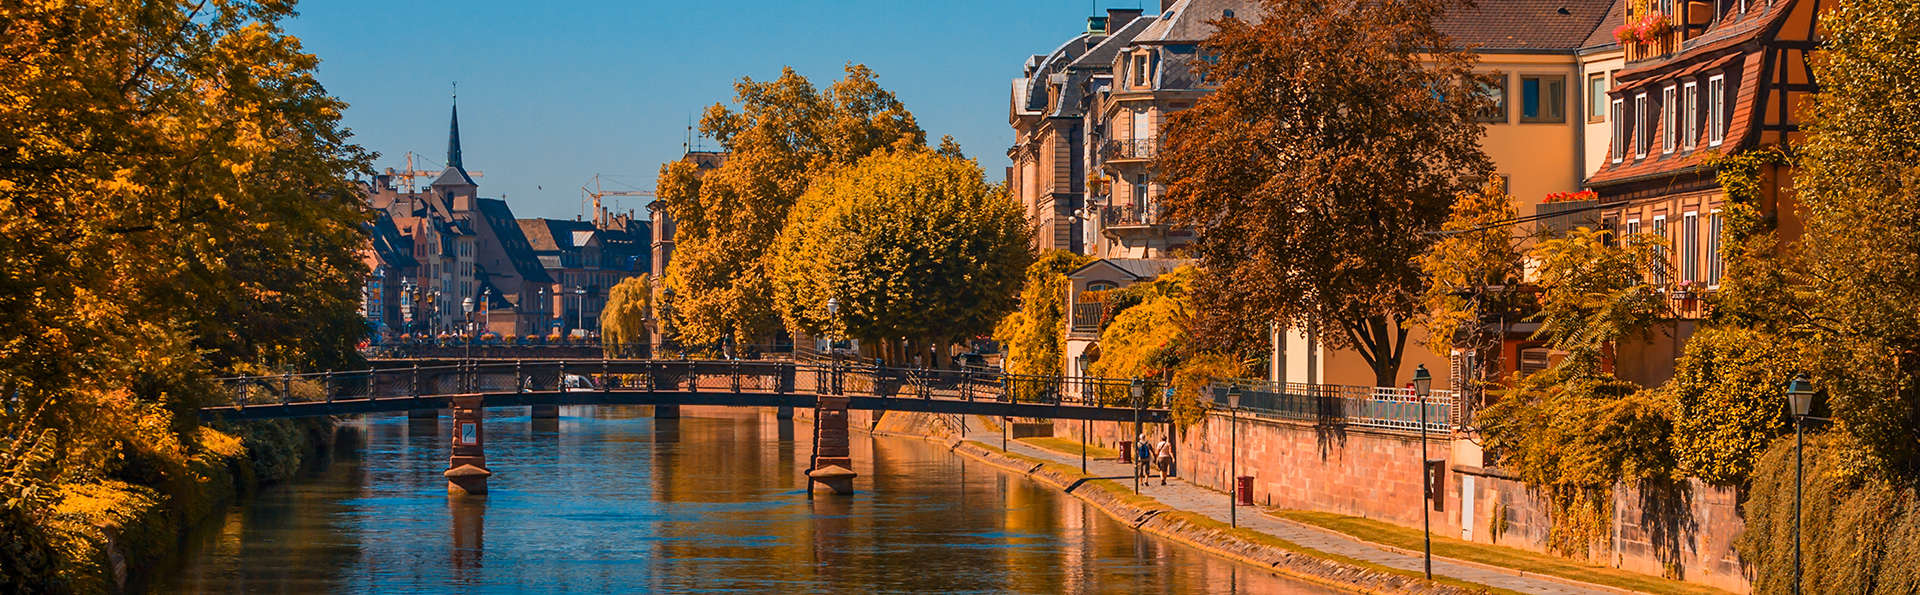 Week-end au cœur de Strasbourg